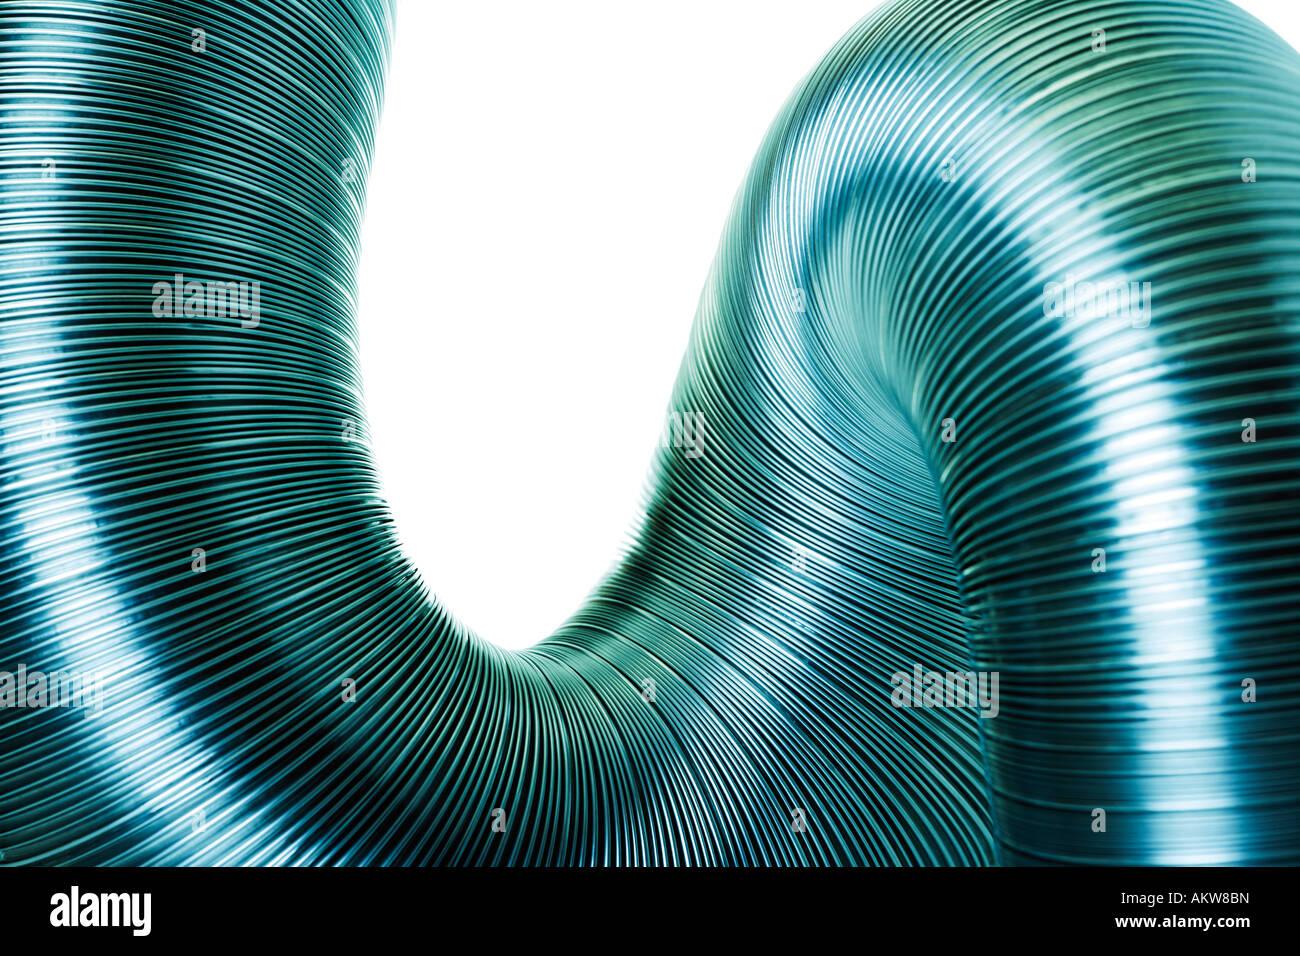 Aluminium tube, close-up - Stock Image